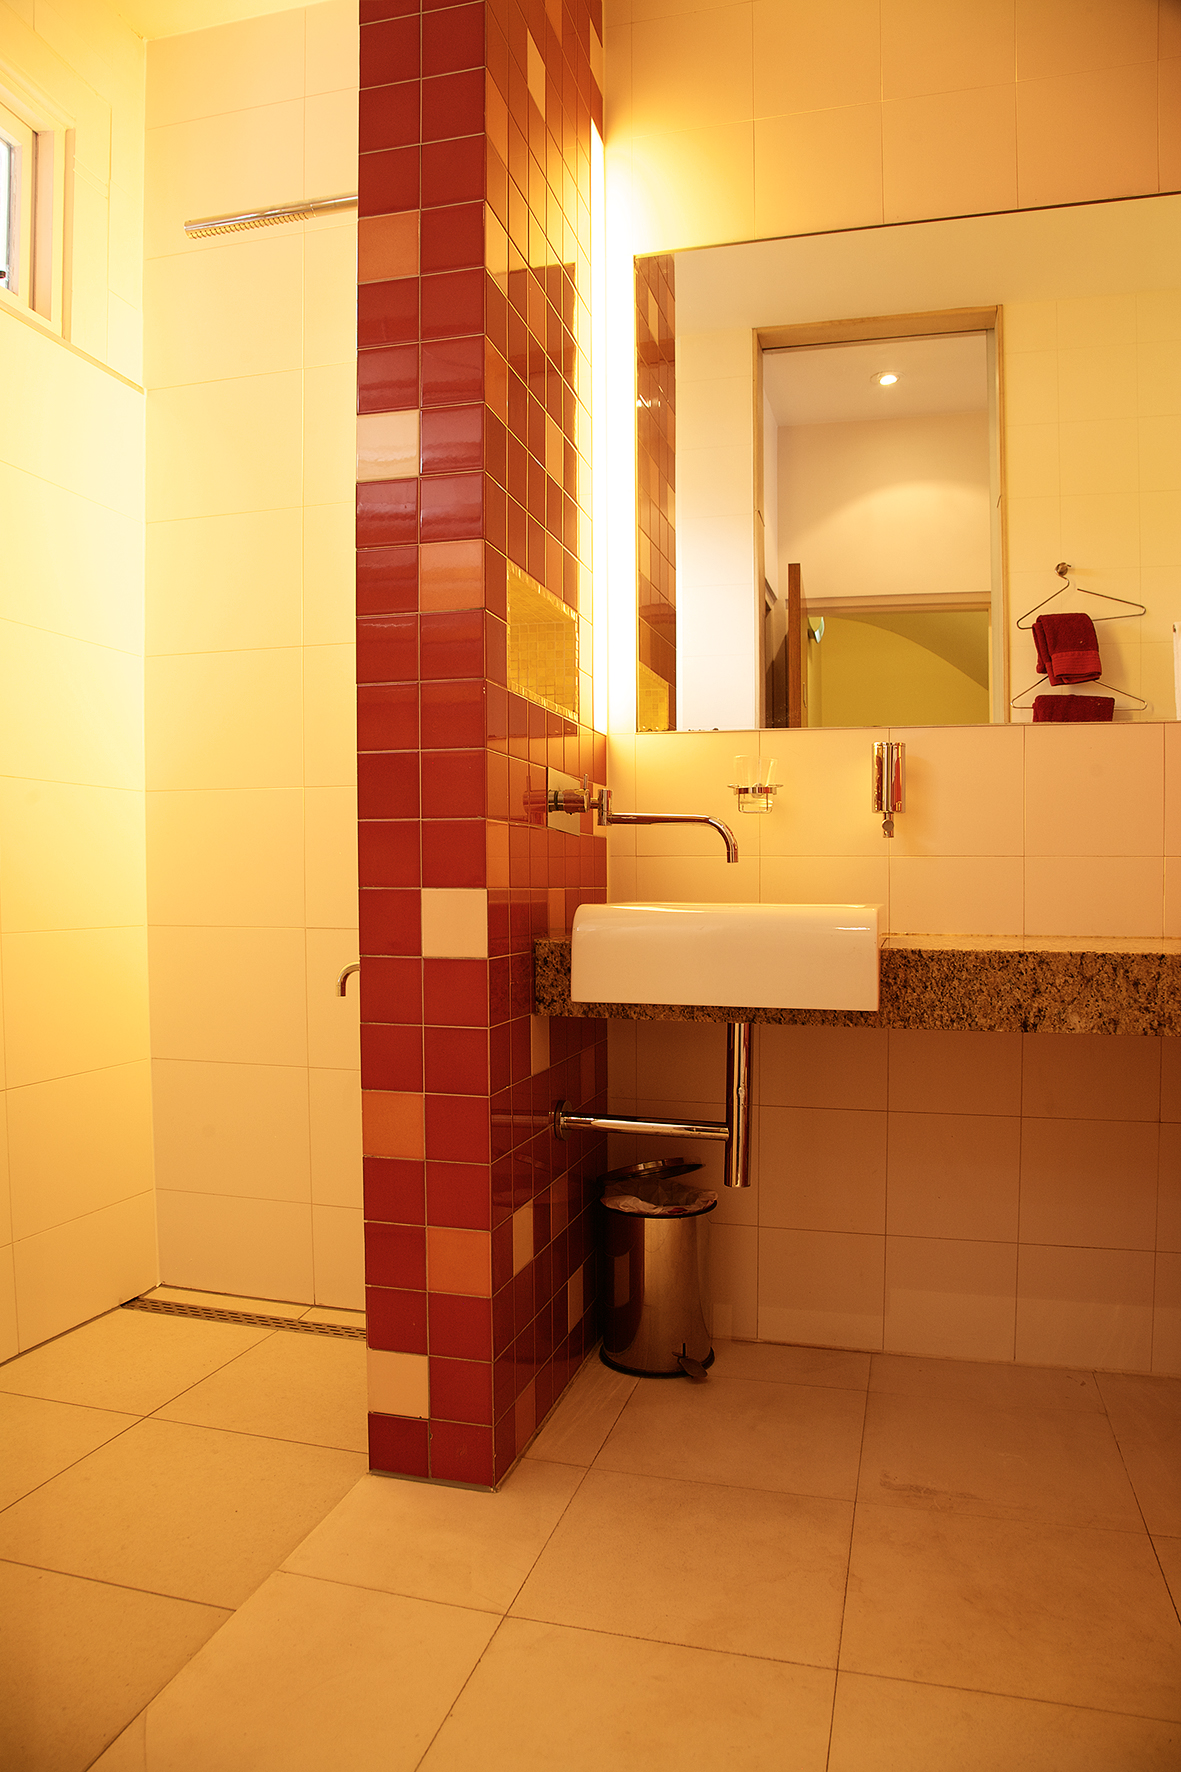 Mandarin bathroom